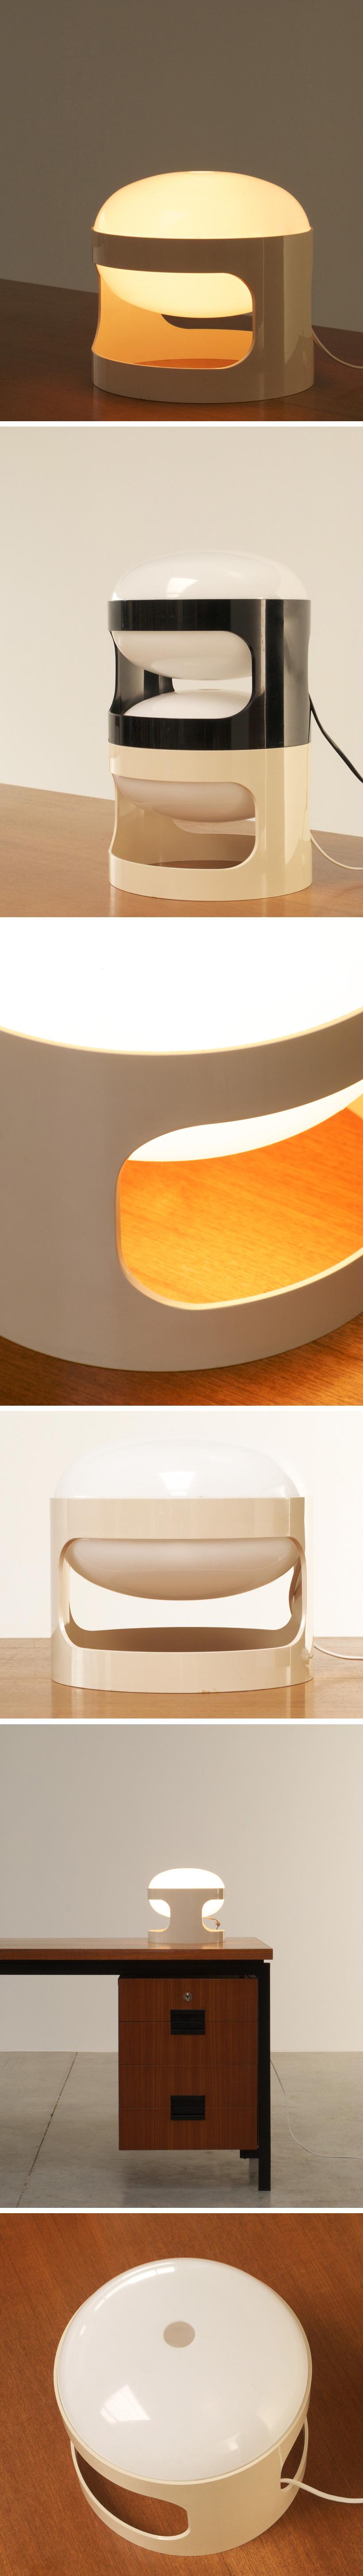 KD27 Joe Colombo Kartell White table lamp Large